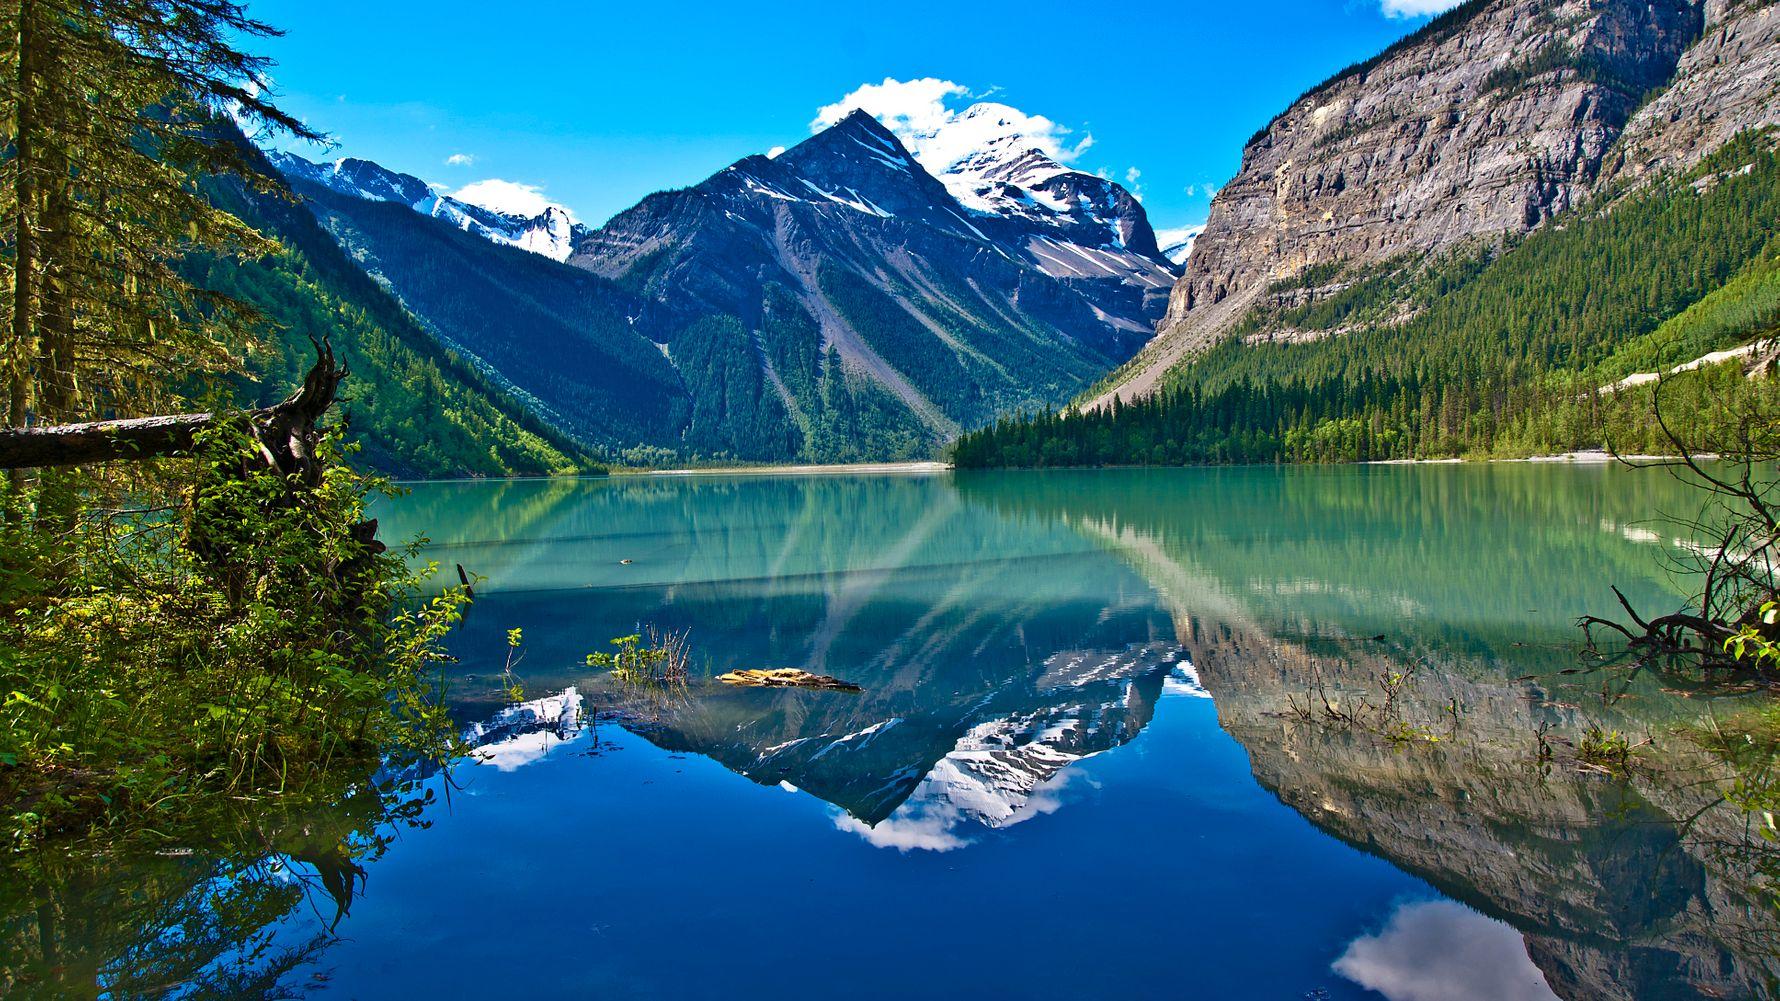 blog-ratgeber-kanada-british-columbia-berg-spiegelung-natucate